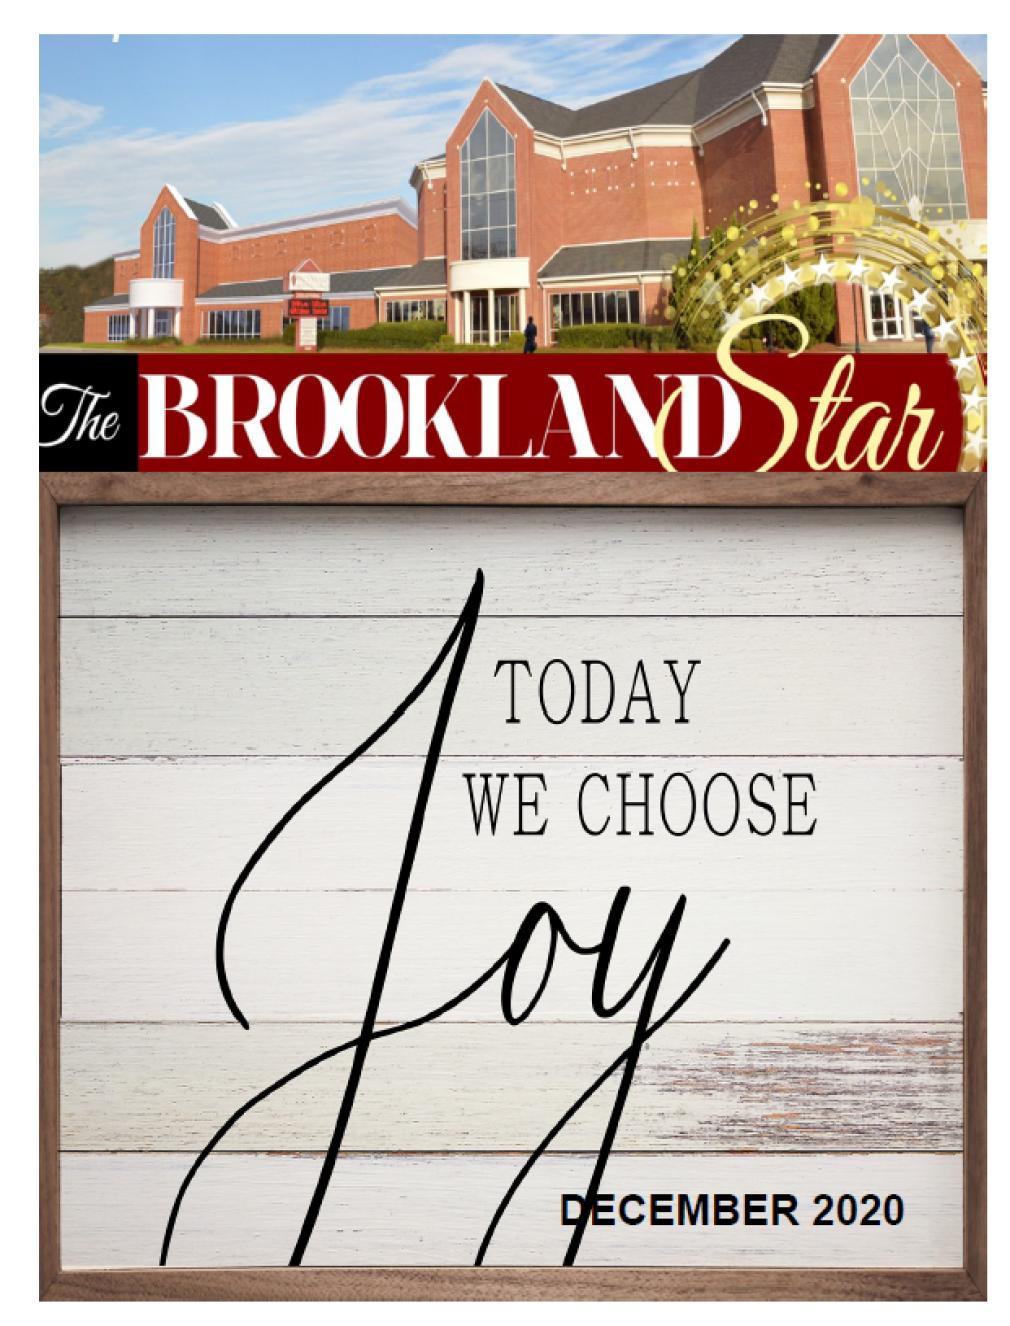 The Brookland Star December 2020 Edition